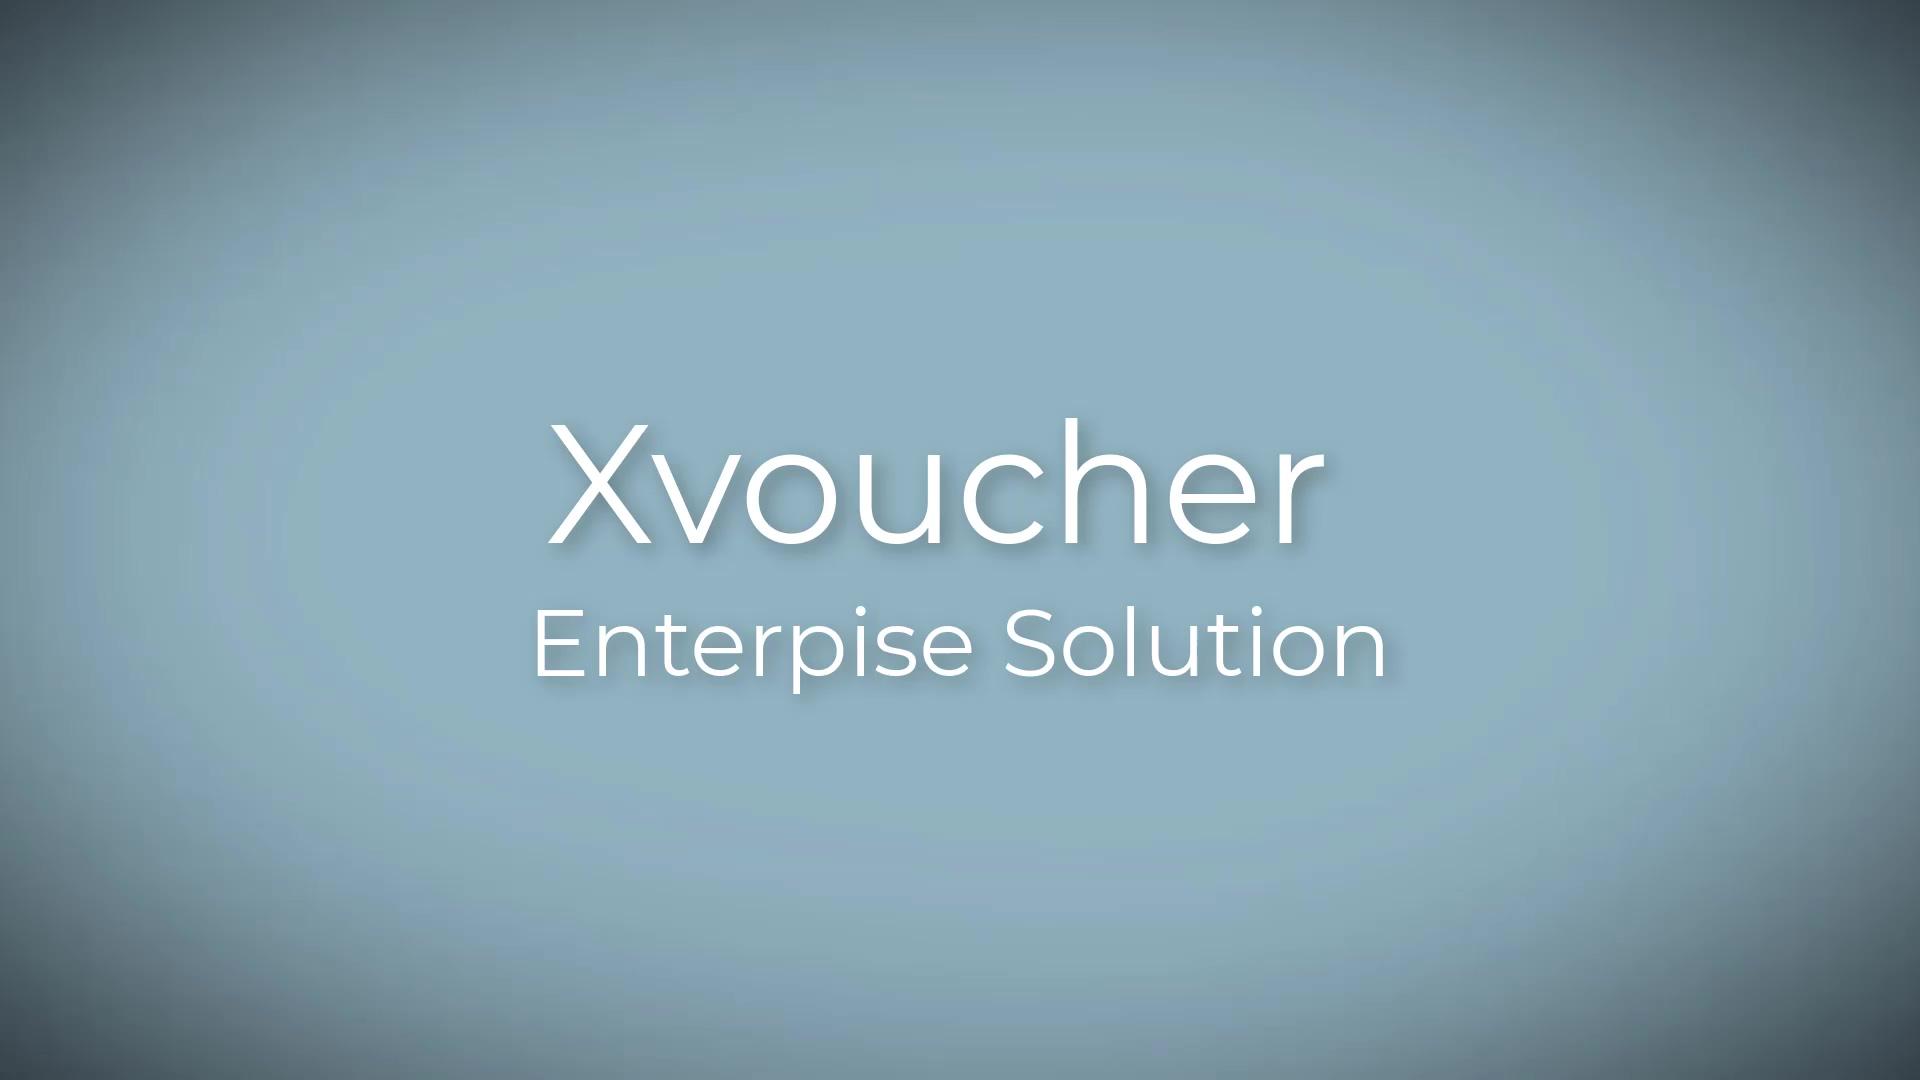 Xvoucher Enterprise Solution